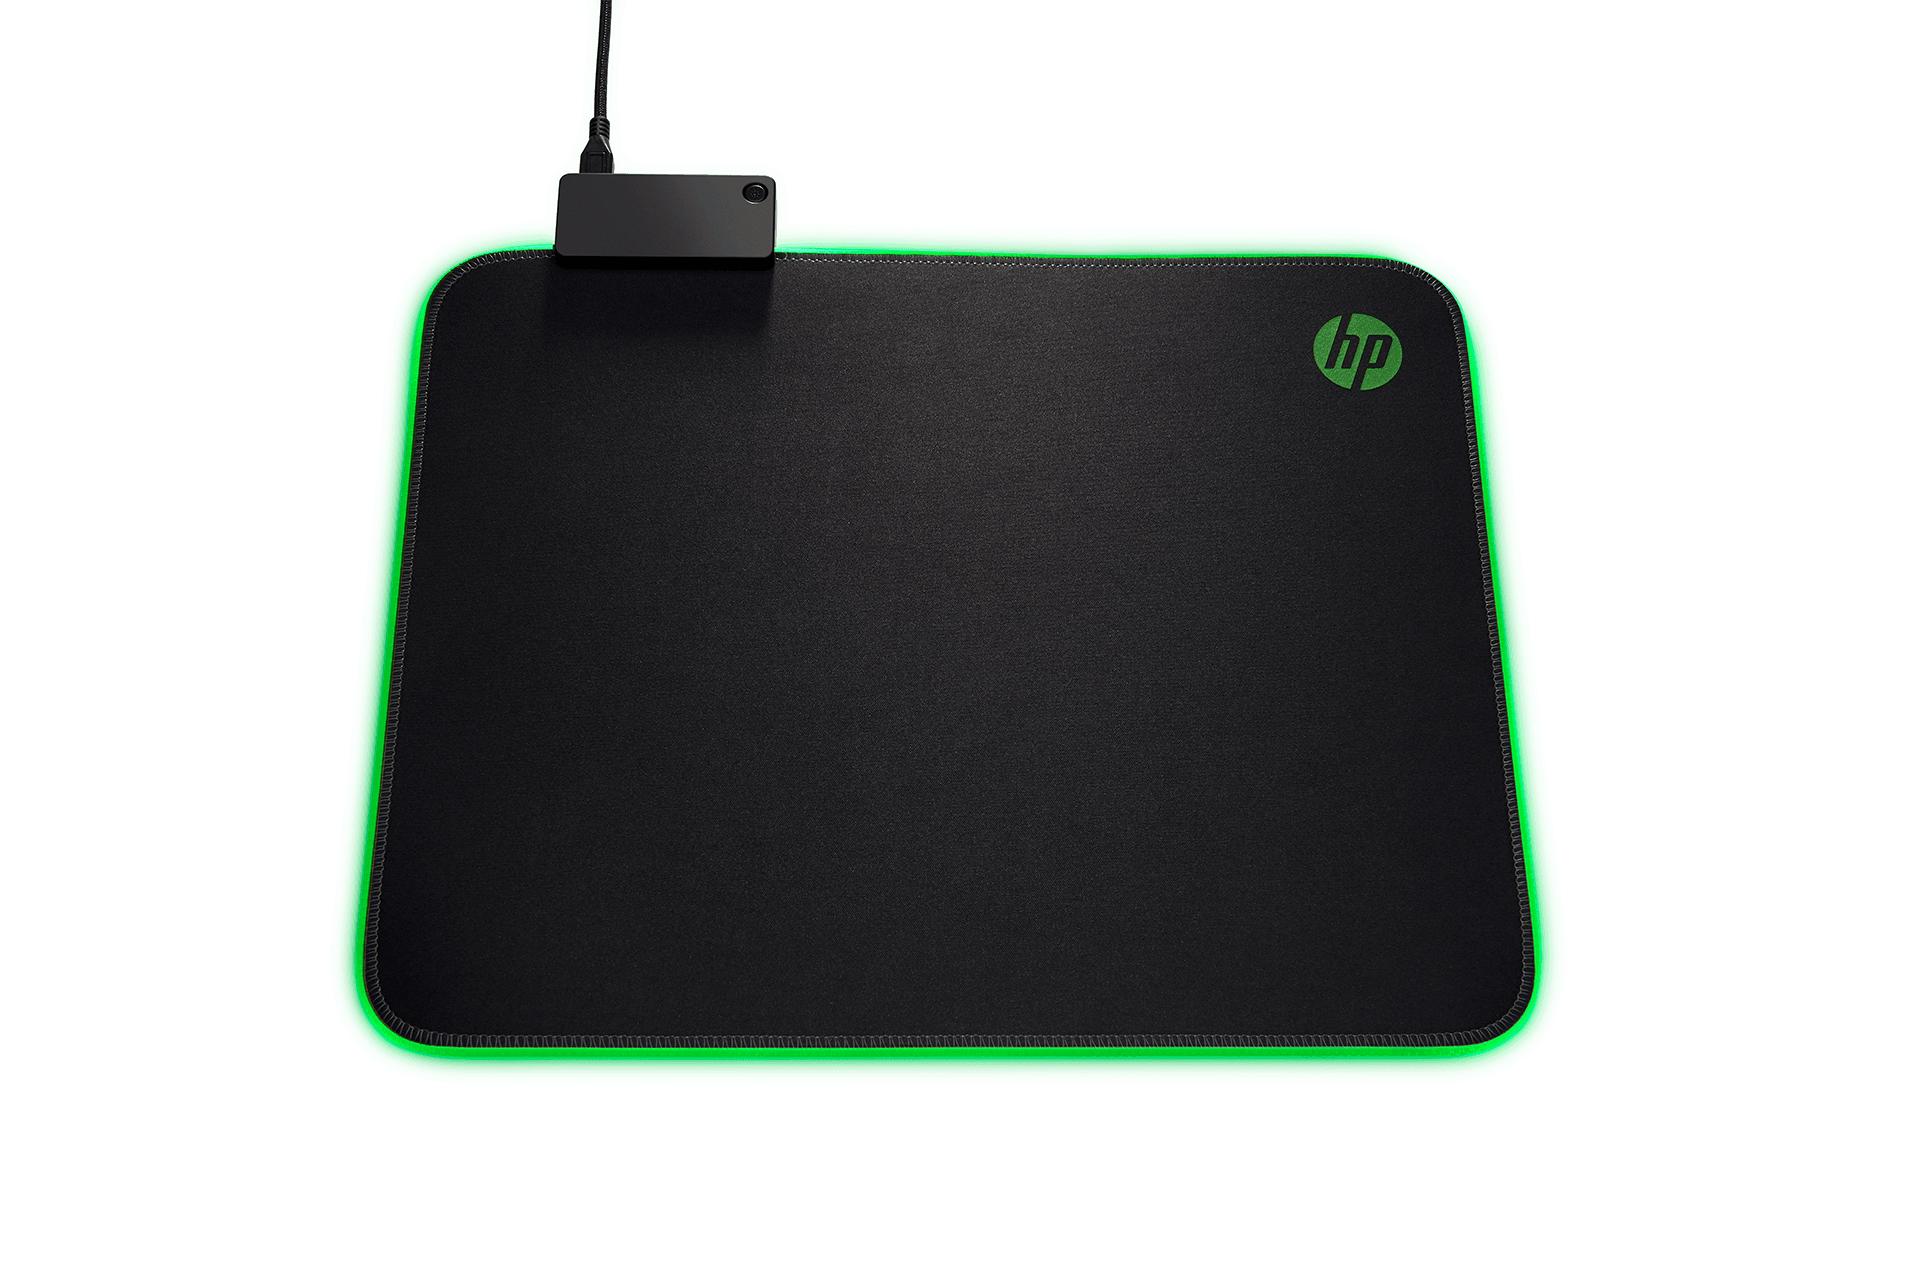 Hp Pavilion Gaming Mousepad 400 3 - Hynerd.it